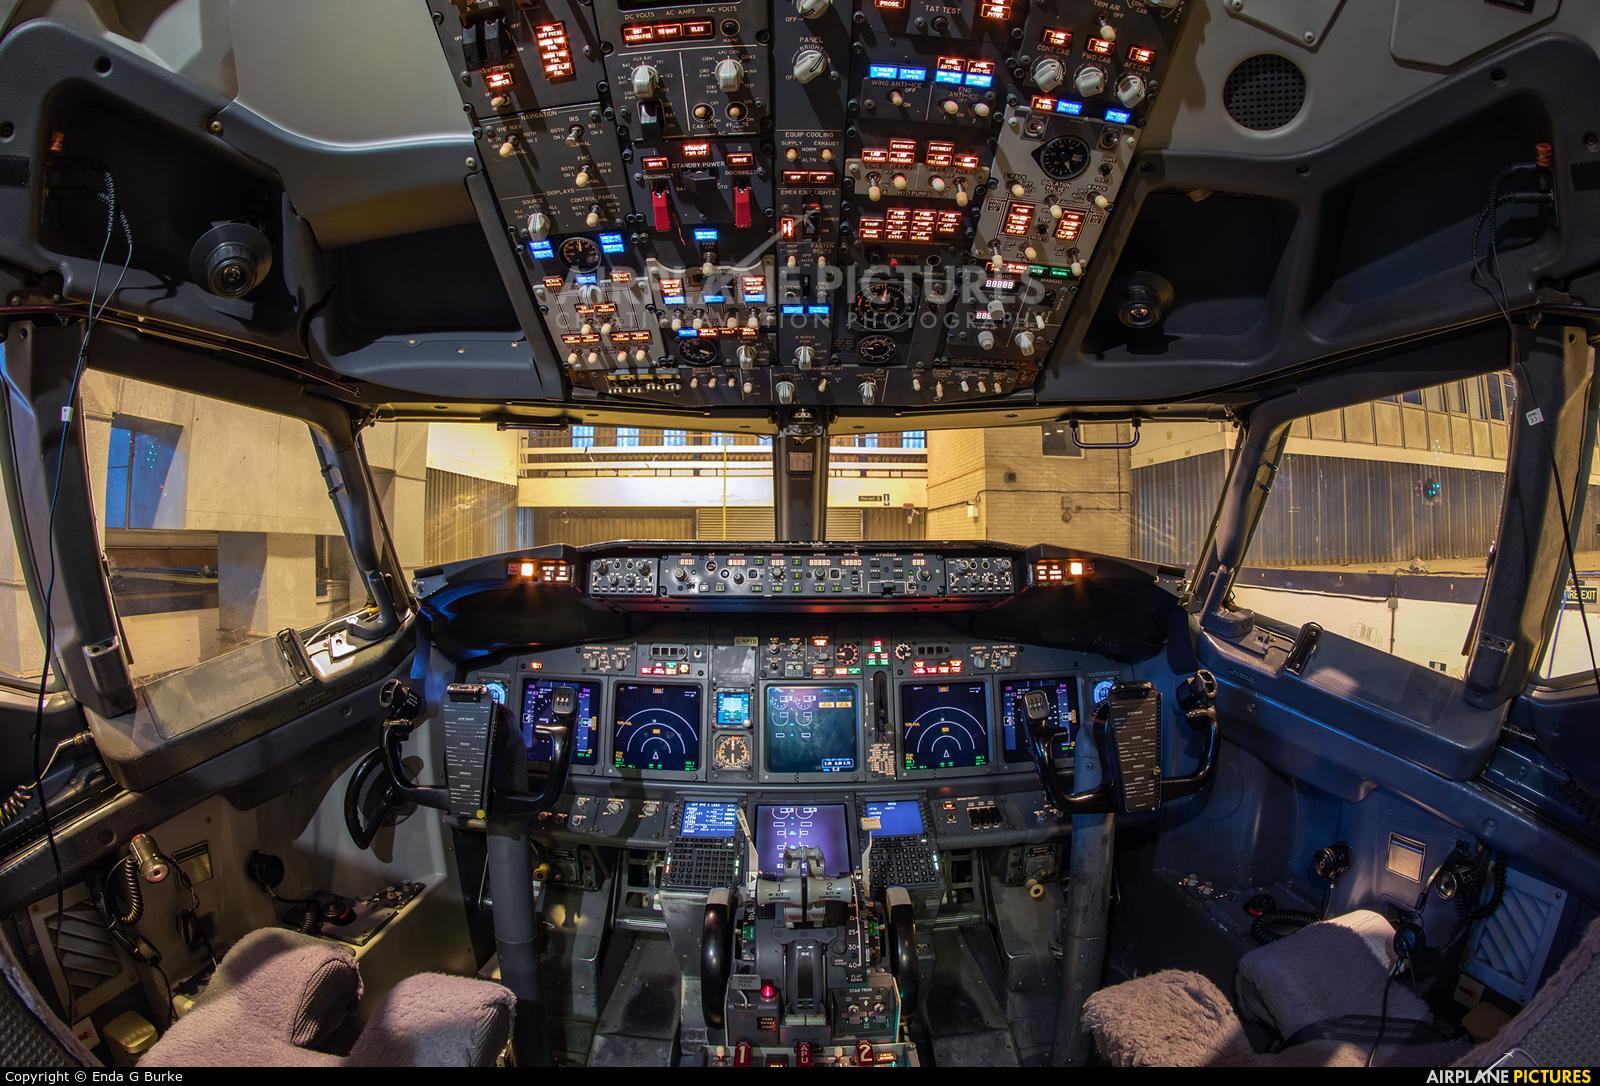 West Atlantic G-NPTD aircraft at East Midlands